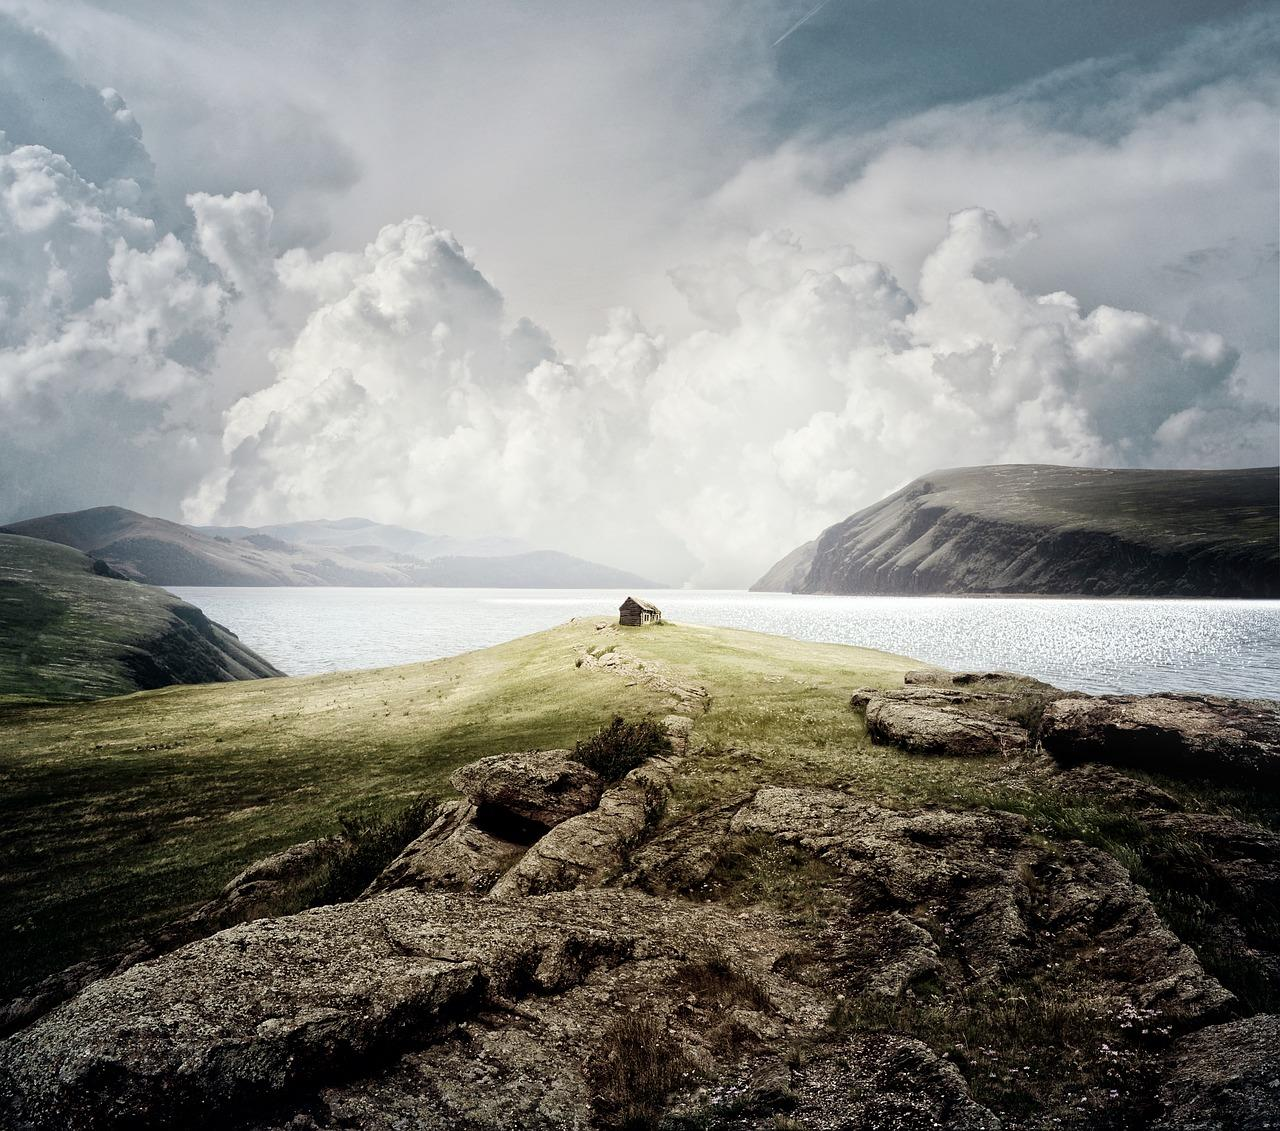 landscape-2752572_1280.jpg